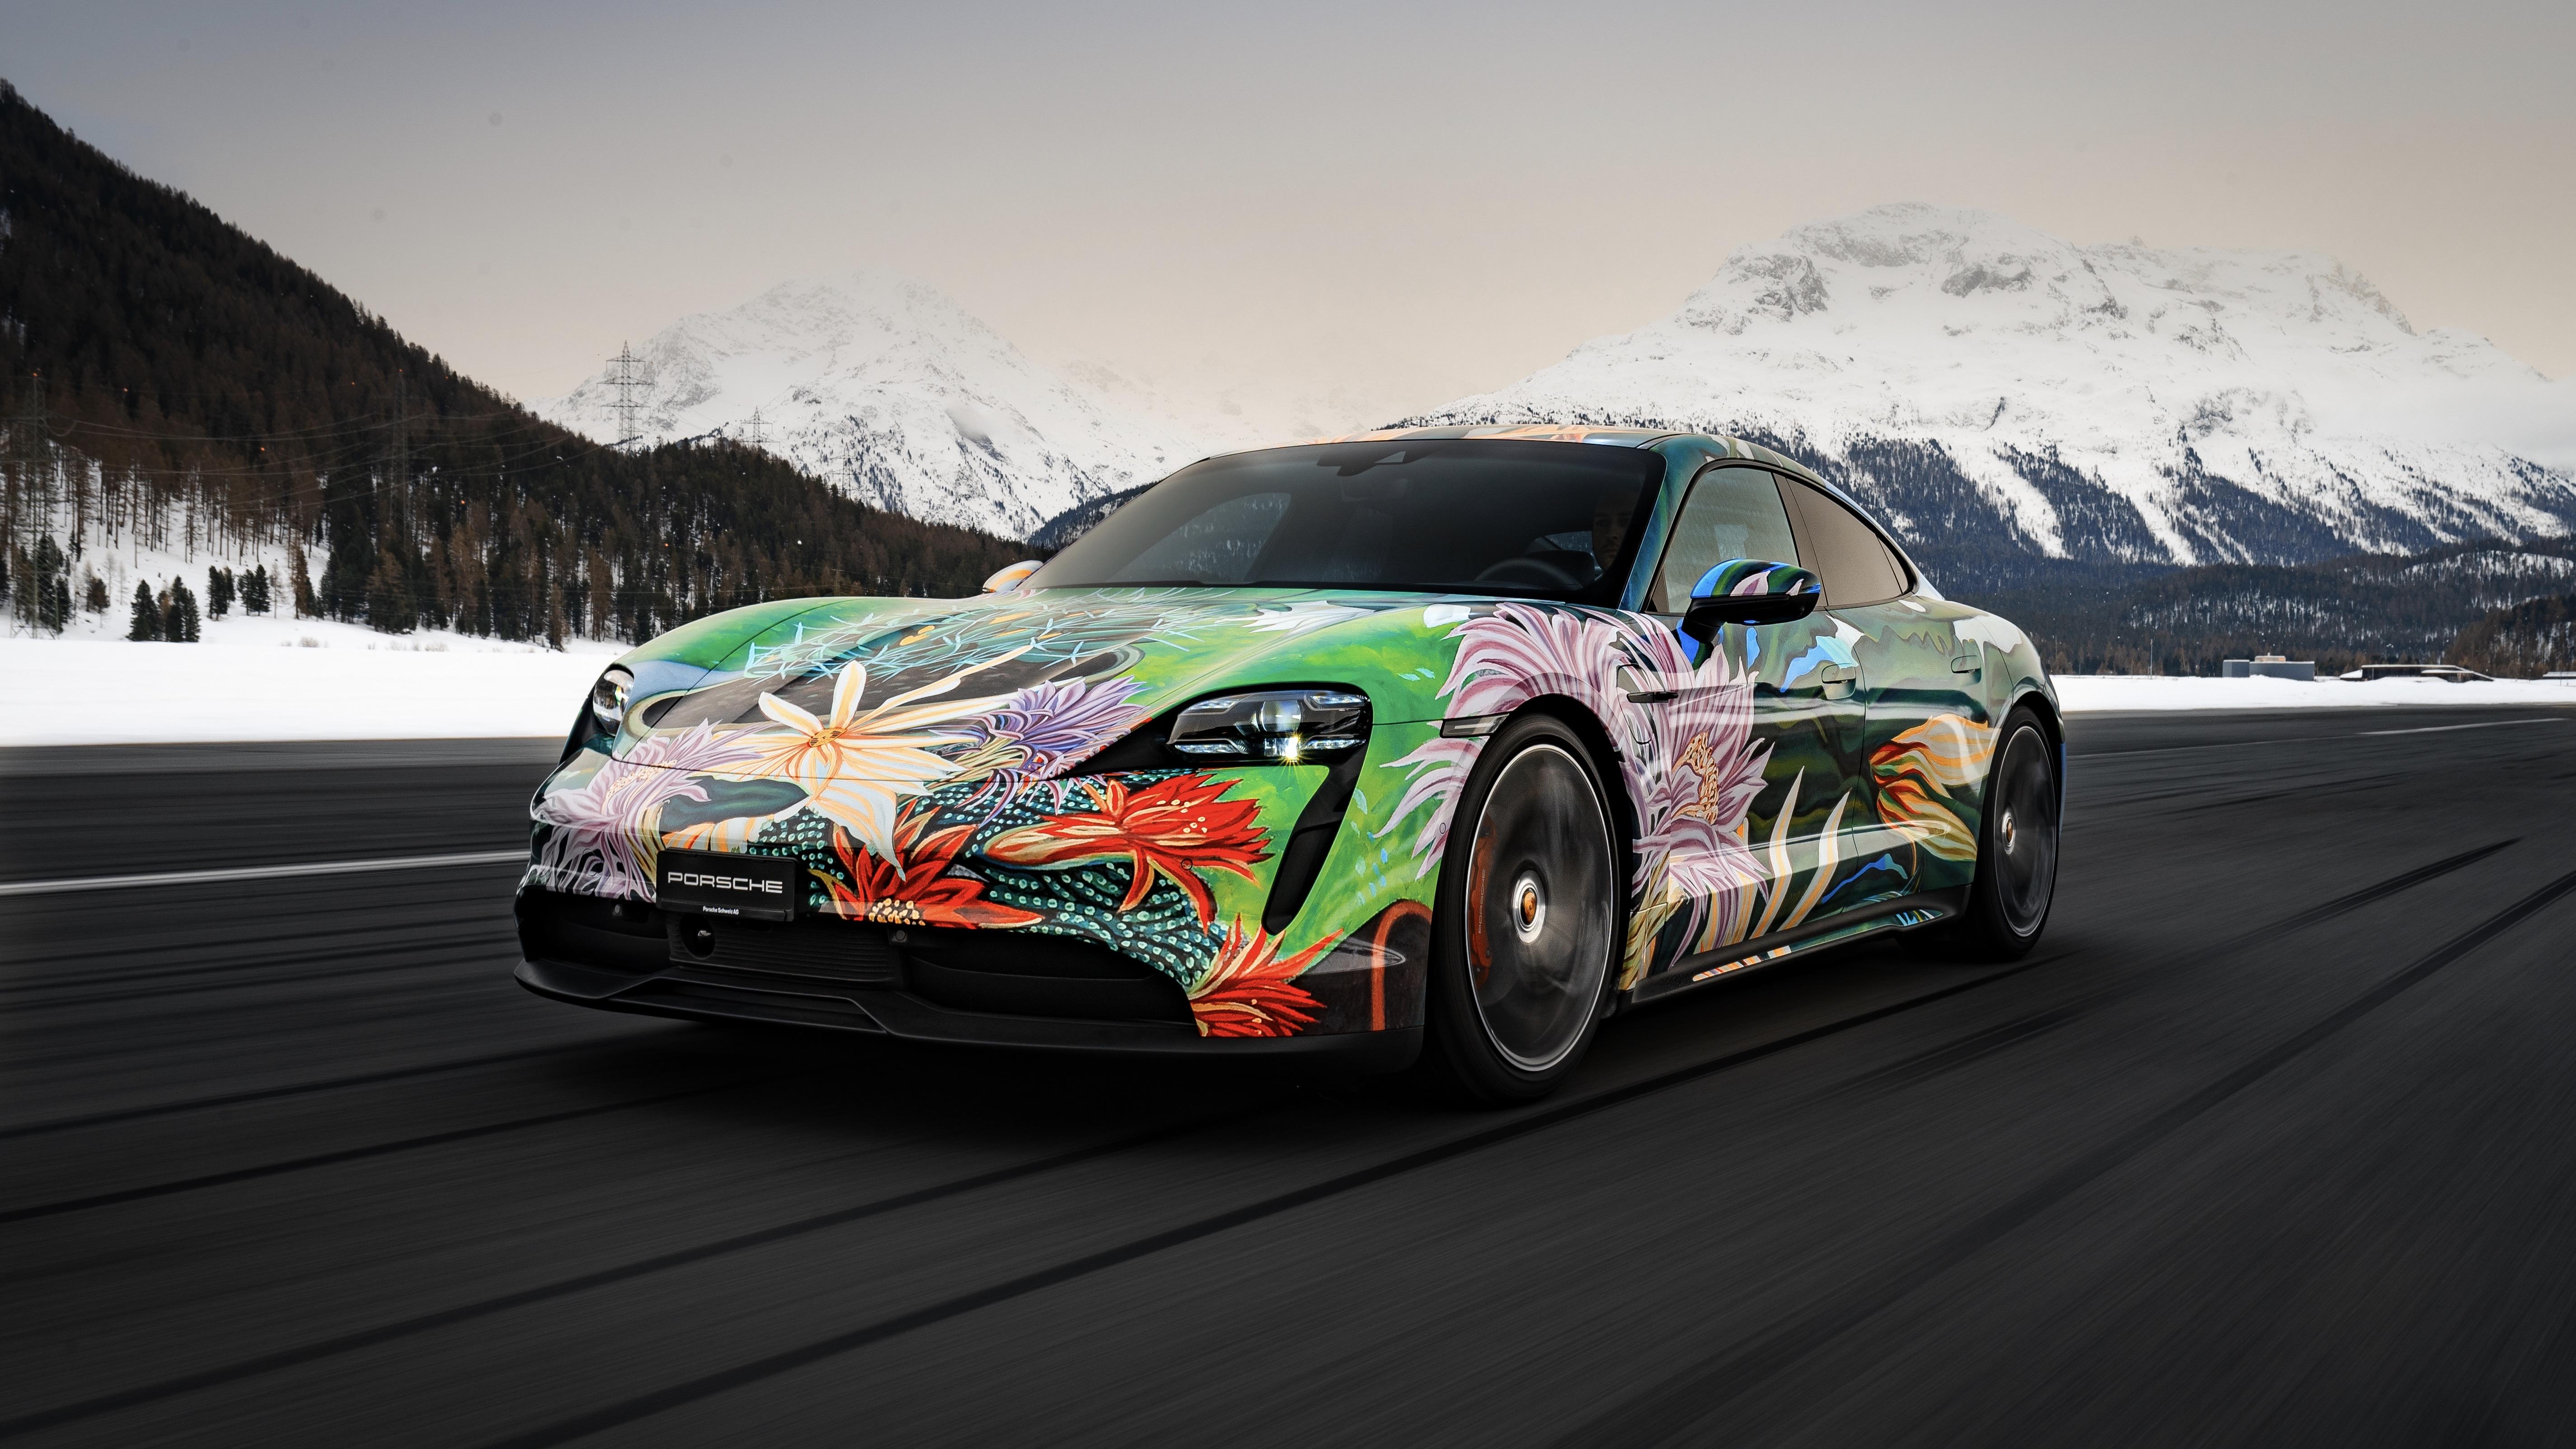 Porsche Taycan 'Art Car' being sold for a good cause